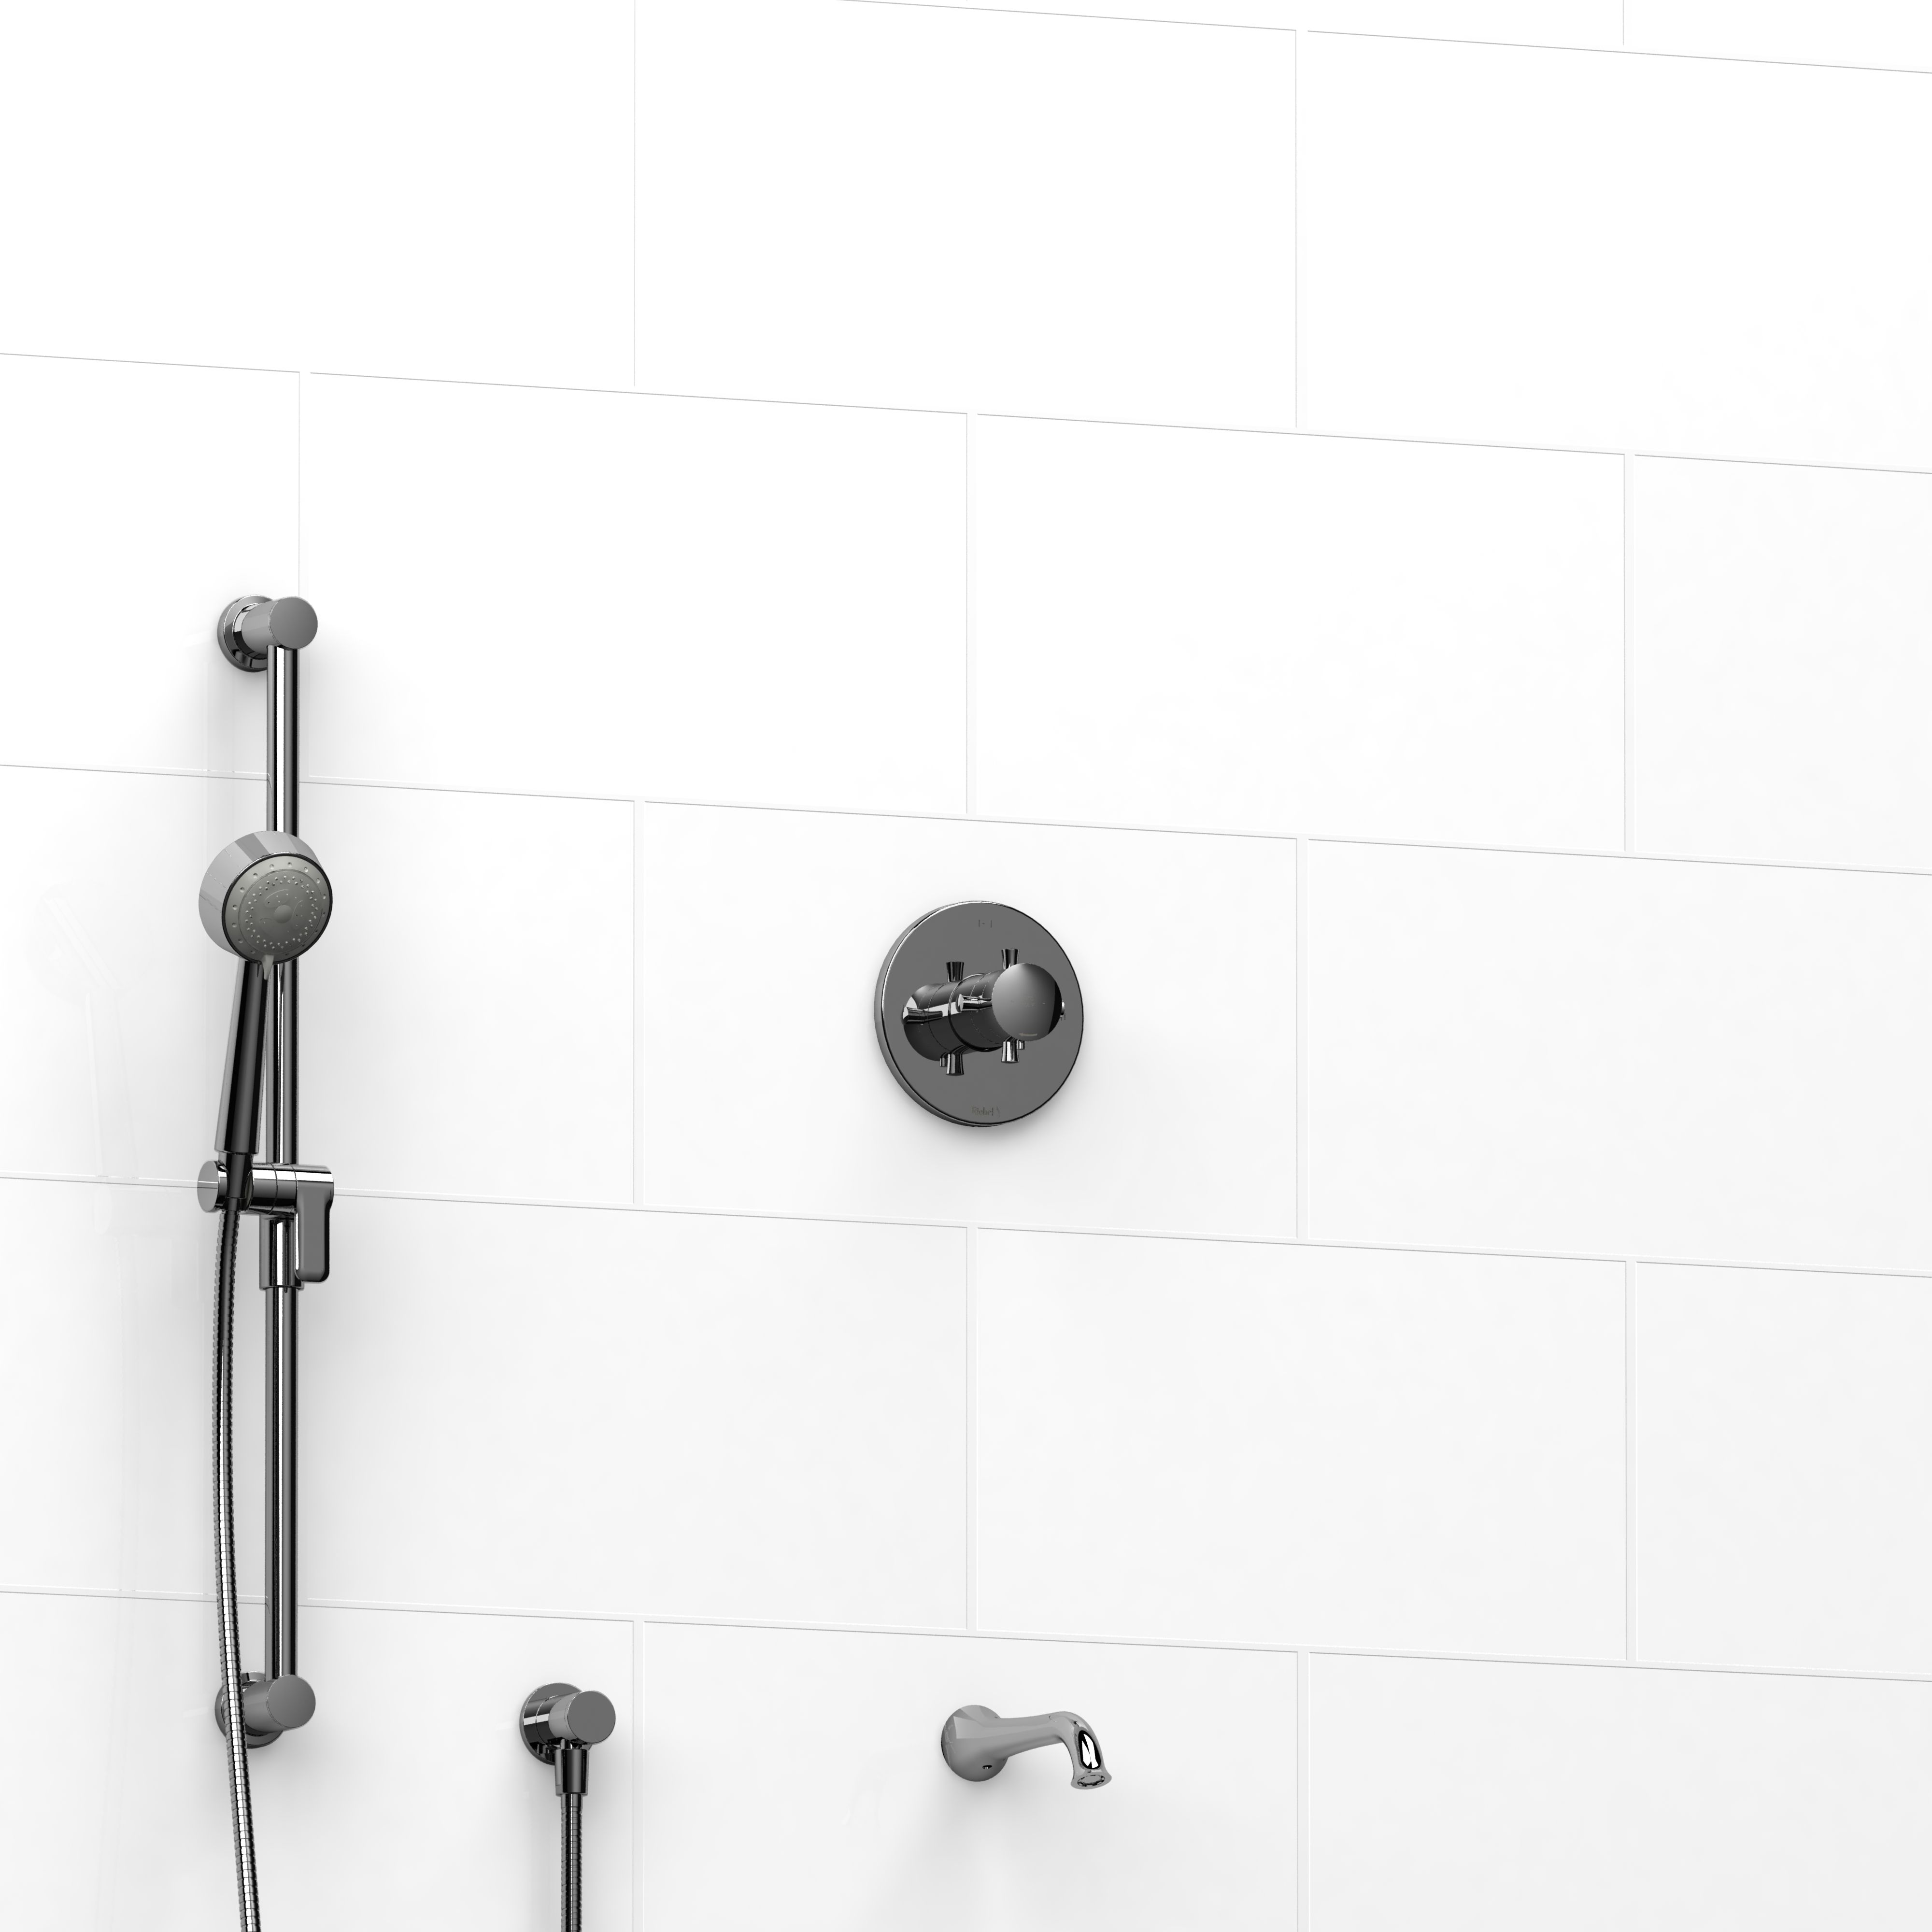 Gentil Riobel Edge Shower/ Tub Kit. Fixture For Guest Bath